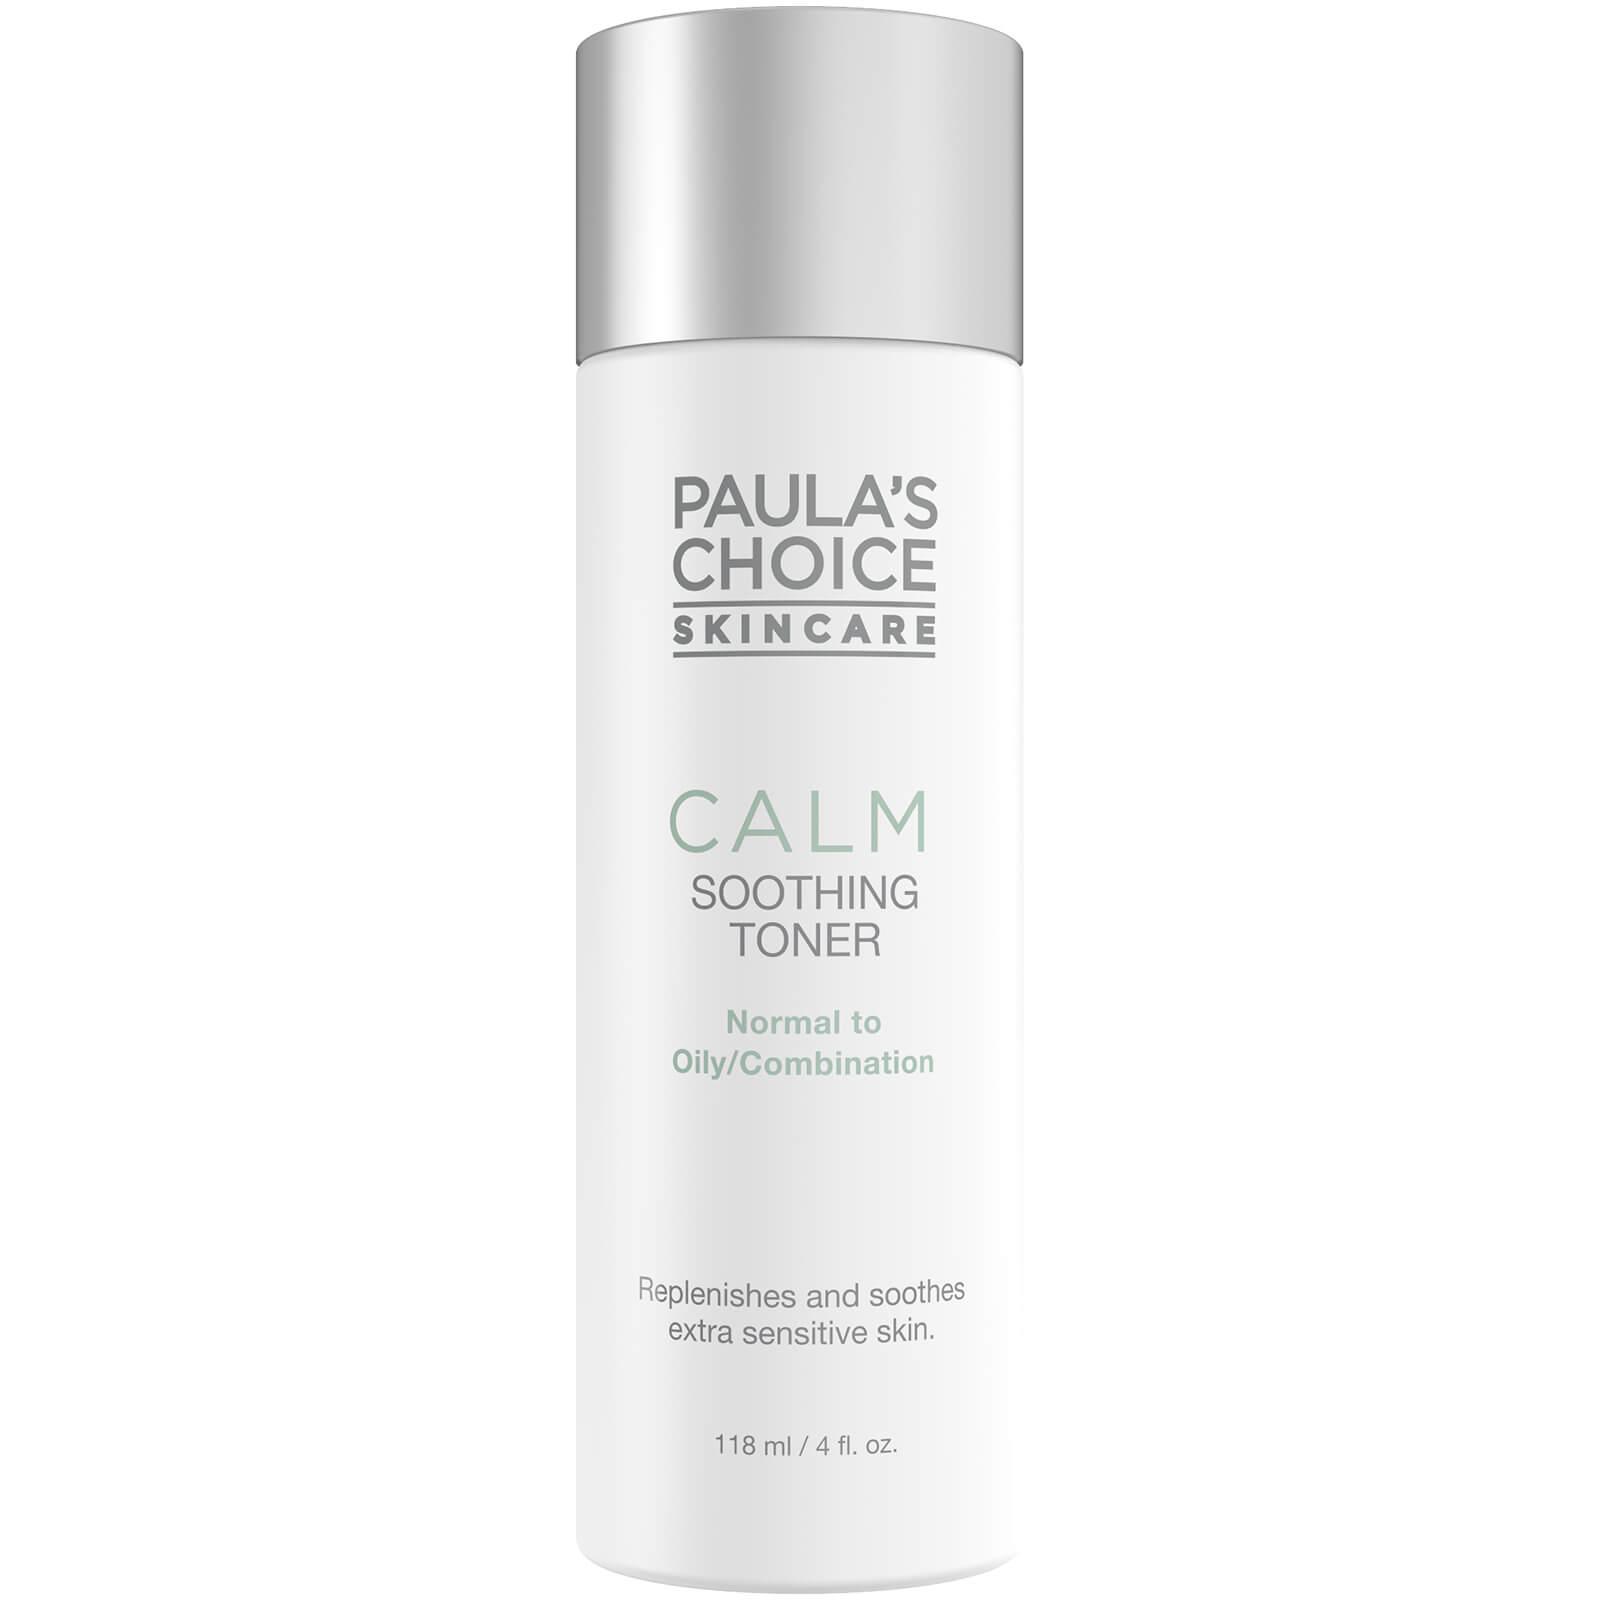 Nước hoa hồng cho da dầu và nhạy cảm Paula's Choice Calm Redness Relief Toner